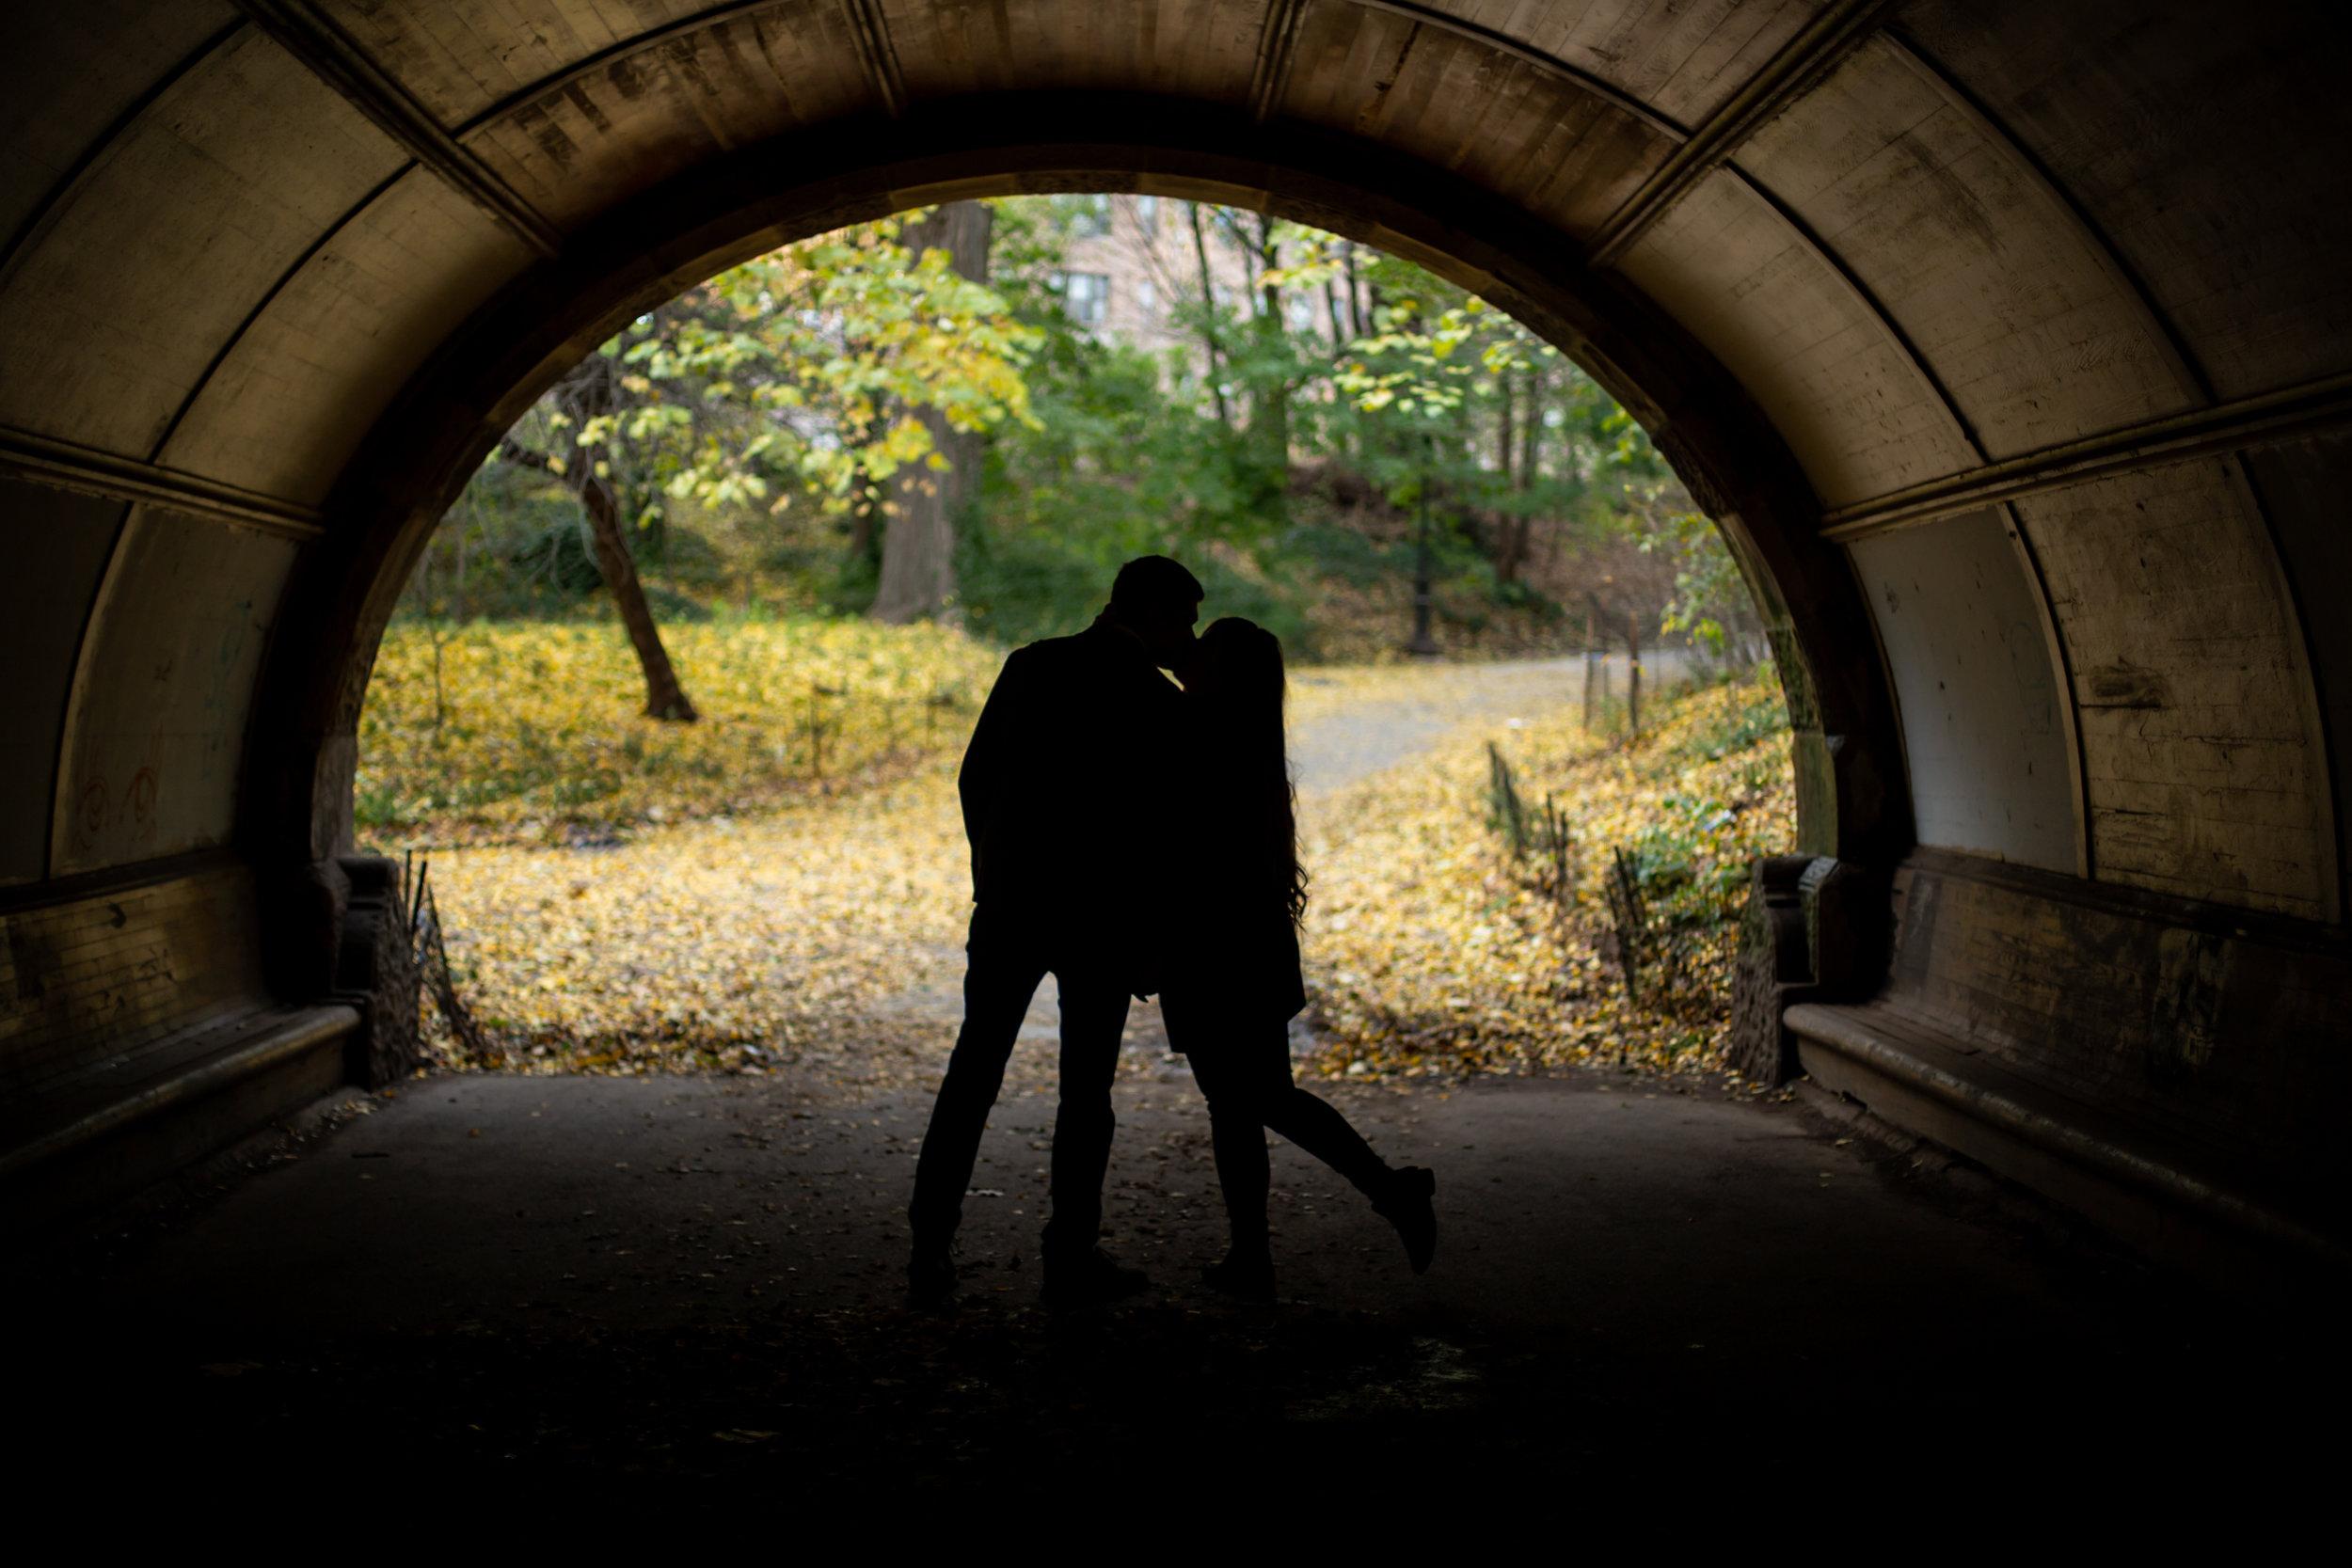 Kate-Alison-Photography-Prospect-Park-Brooklyn-Engagement-Session-Jenna-James-100.jpgKate-Alison-Photography-Brooklyn-Autumn-Prospect-Park-Engagement-Session